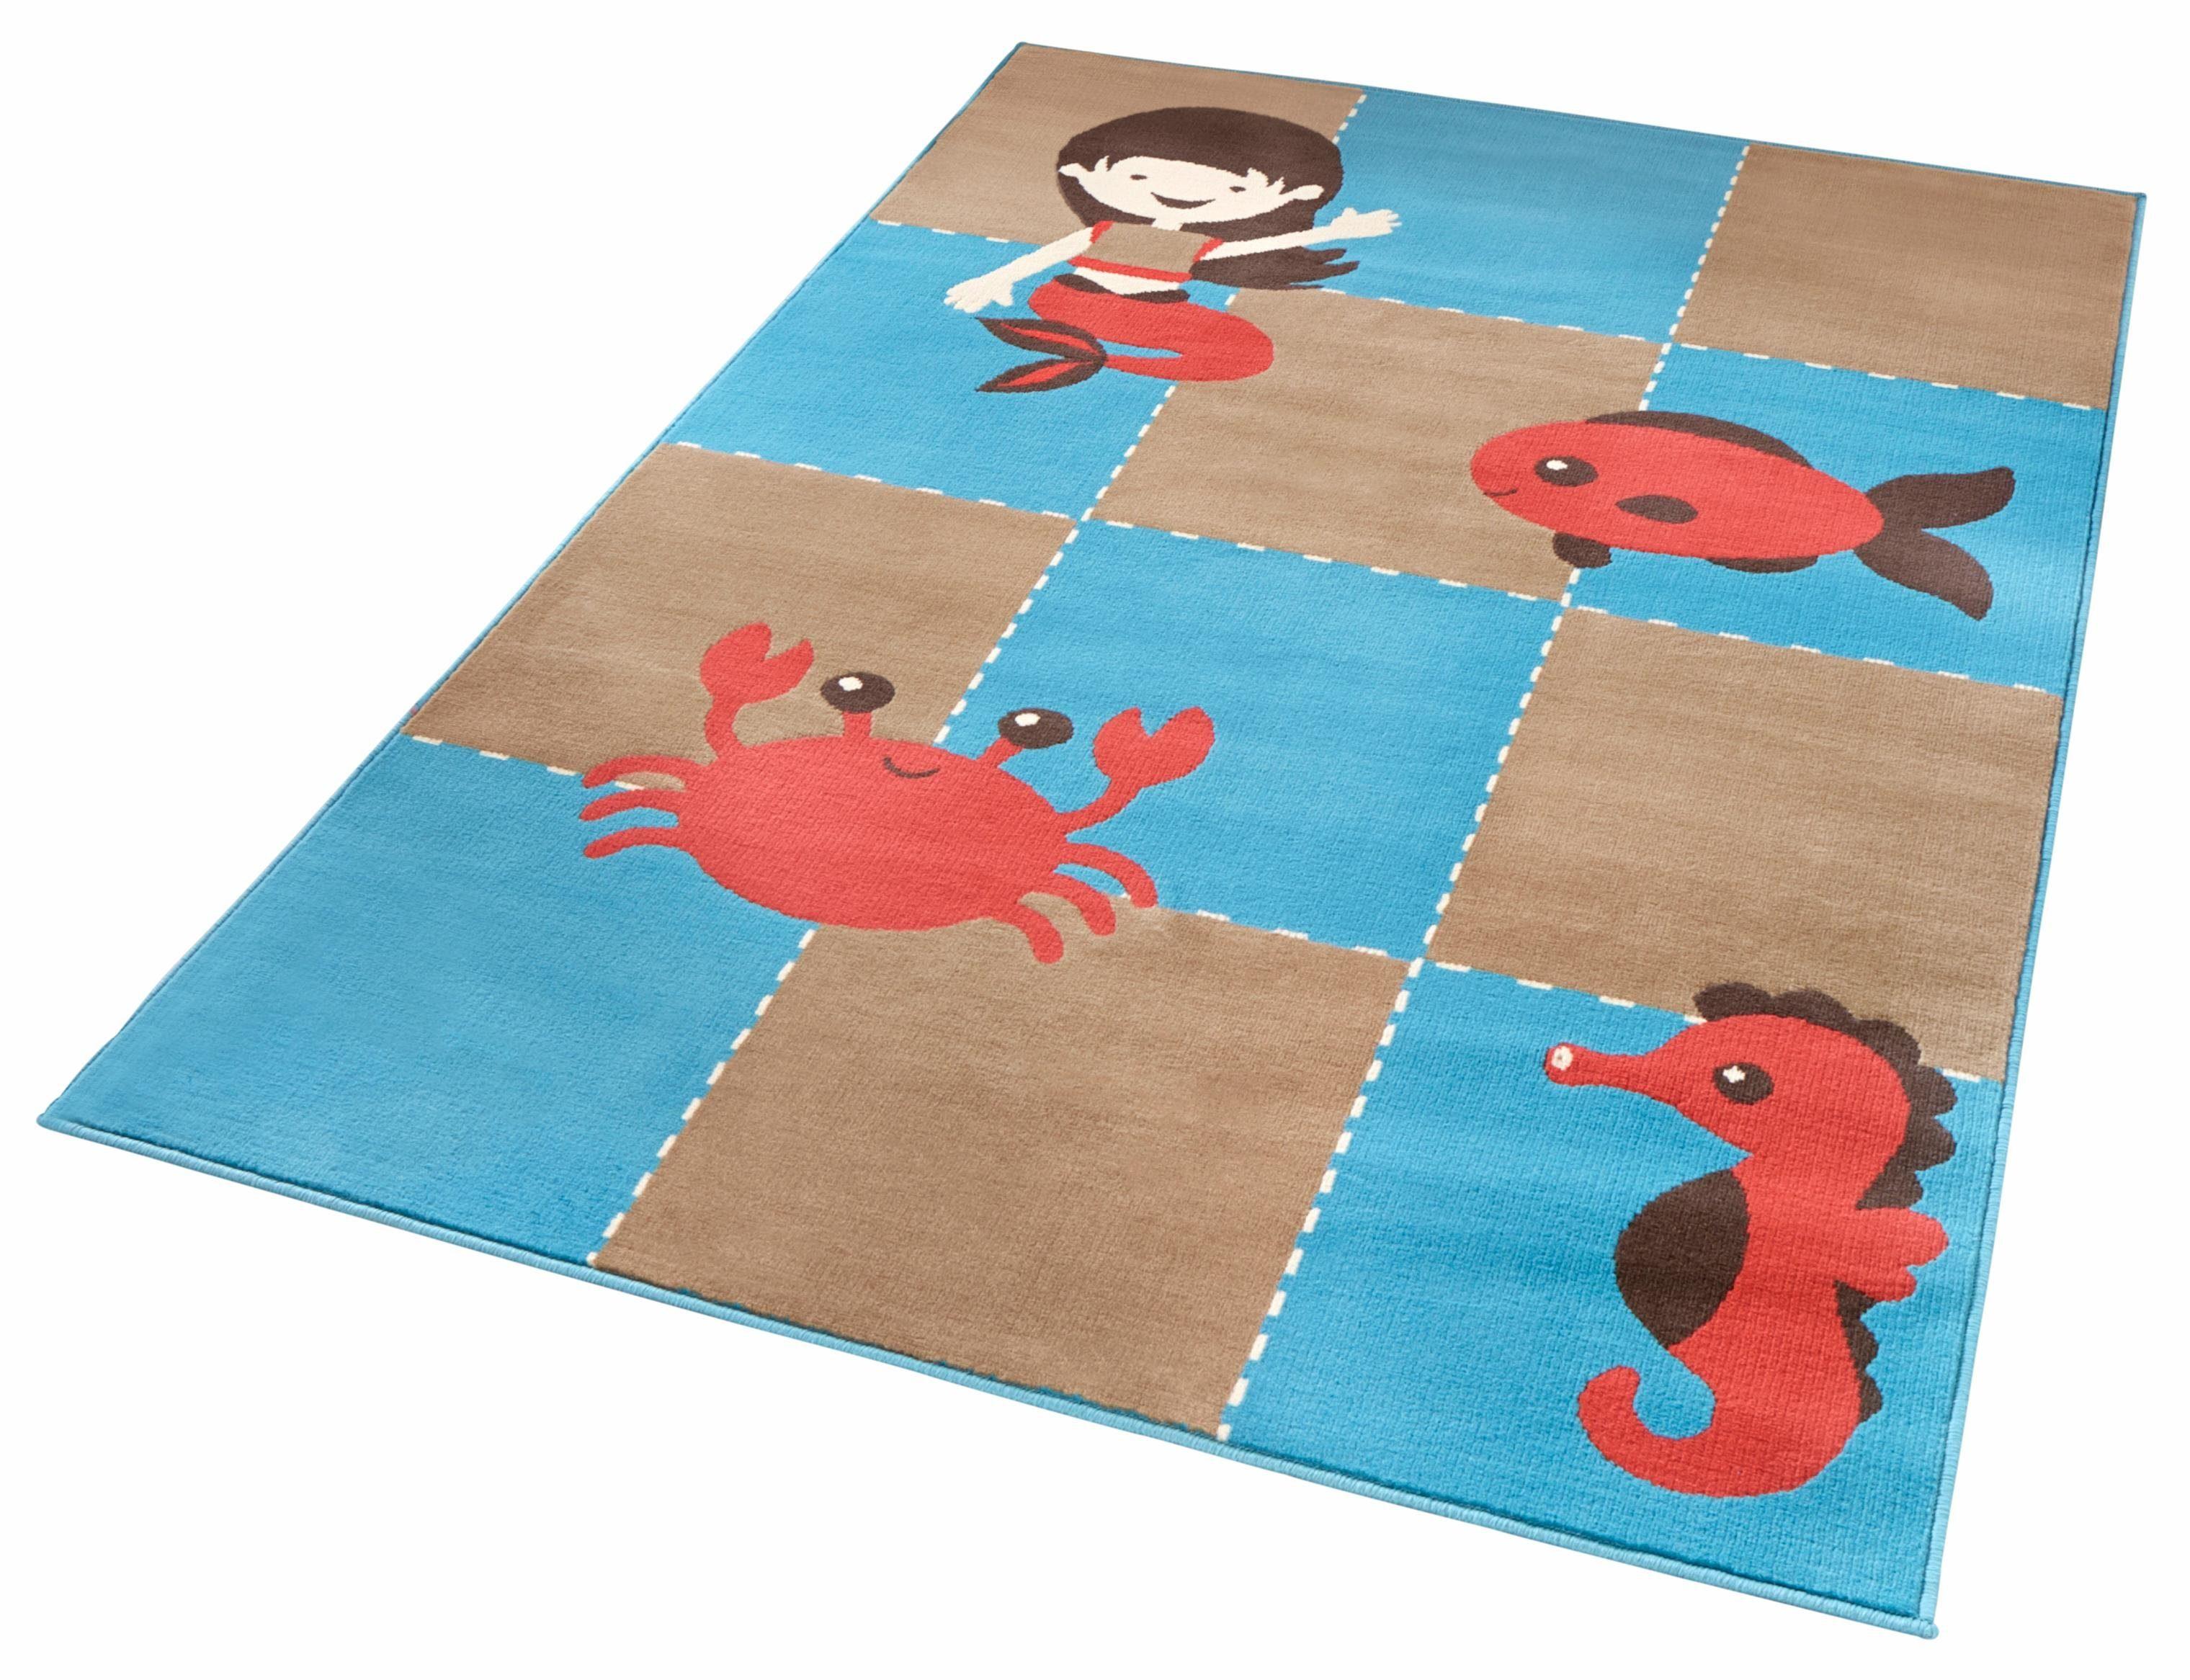 Kinderteppich »Meeresbewohner«, Zala Living, rechteckig, Höhe 9 mm